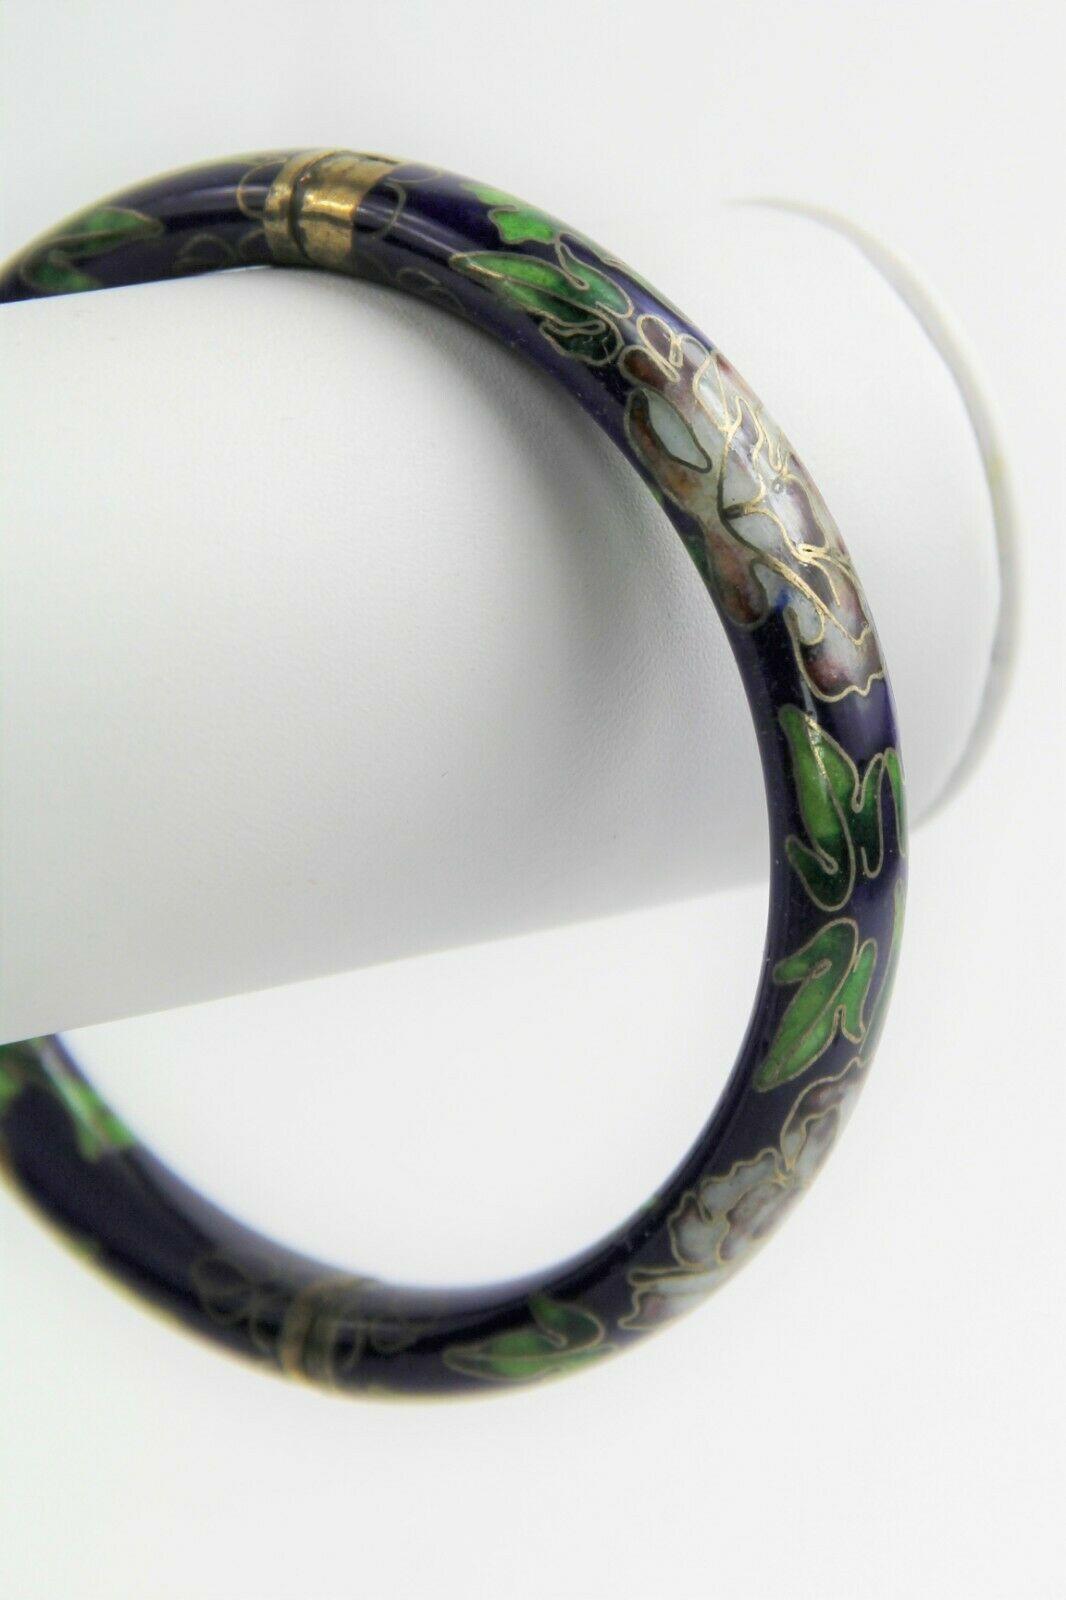 VINTAGE ESTATE Jewelry CHINESE CLOISONNE ENAMEL HINGED BANGLE BRACELET COBALT